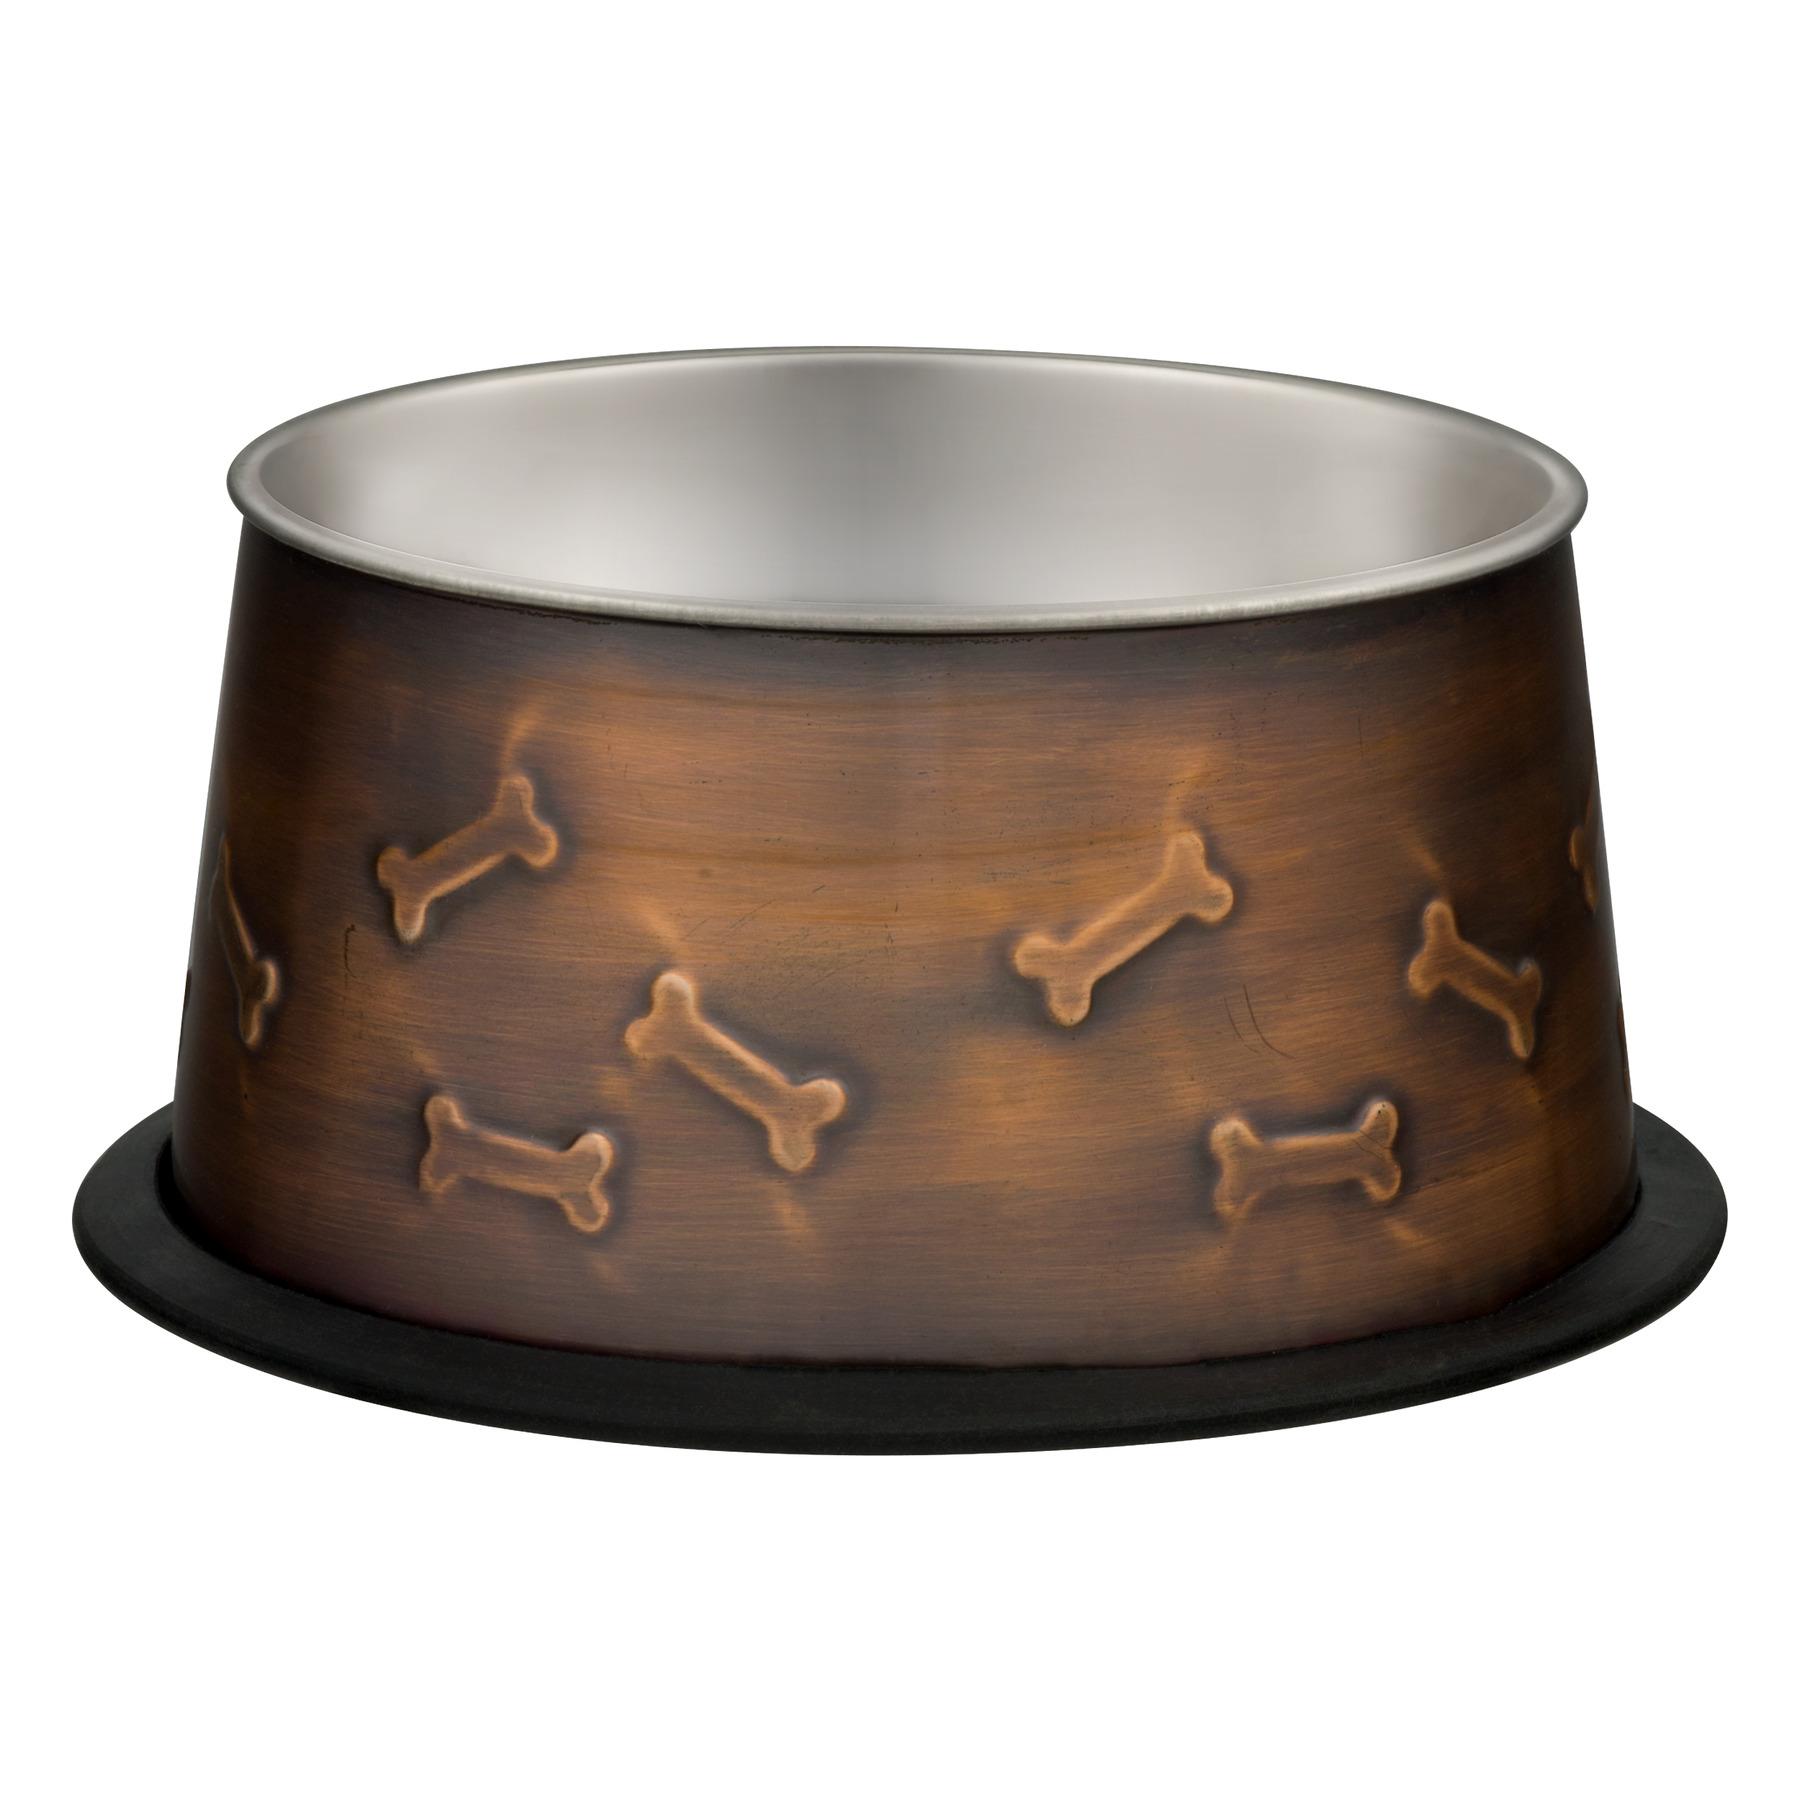 Loving Pets Ruff-N-Tuff No-Tip No-Slip Dish Antique Copper, 1.0 CT